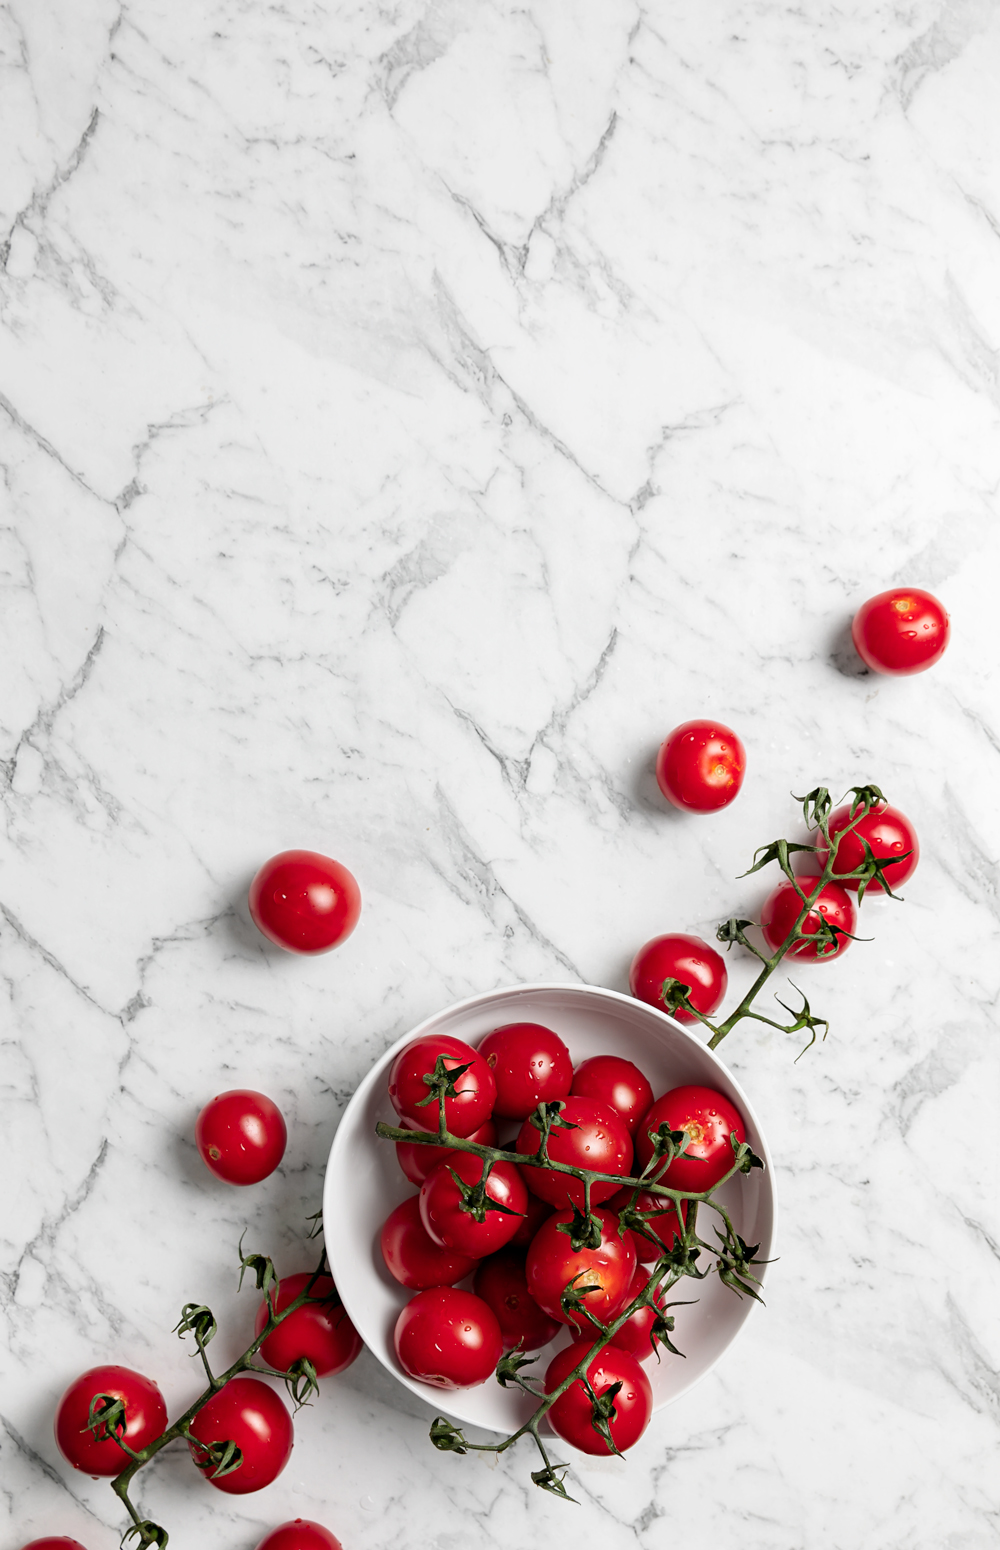 bowl of cherry tomatoes | www.curatedlifestudio.com